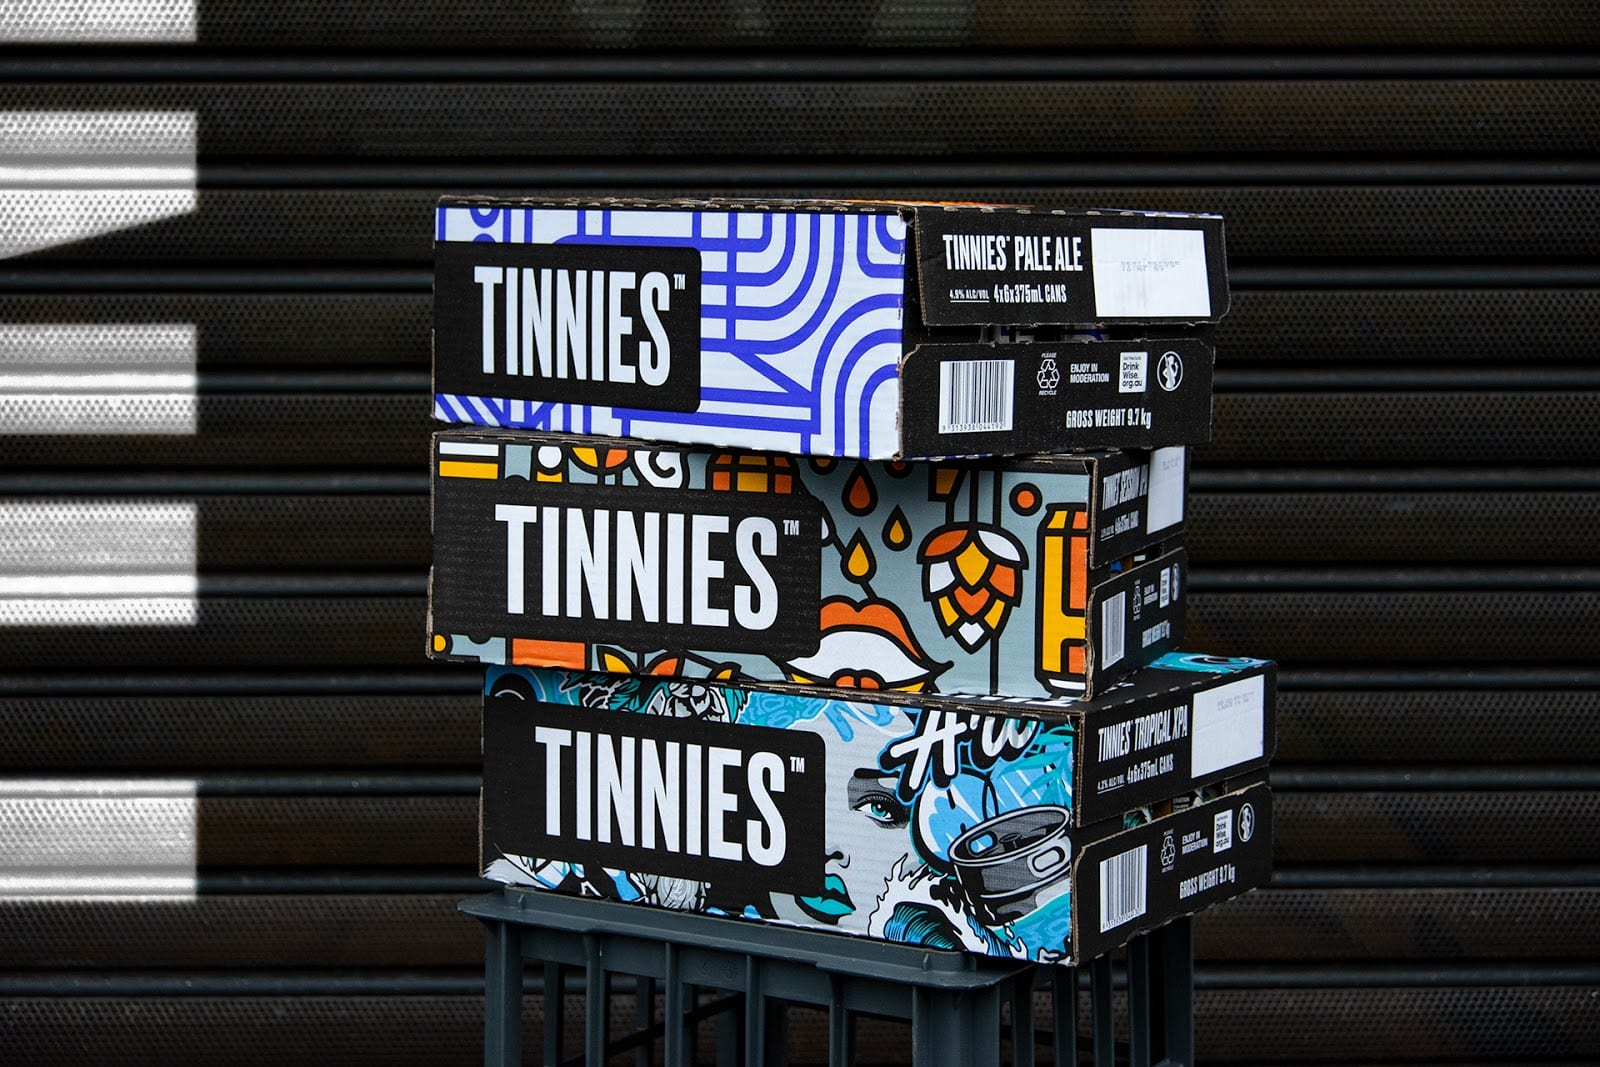 11 tinnies case study - Ach, tie obaly – Tinnier